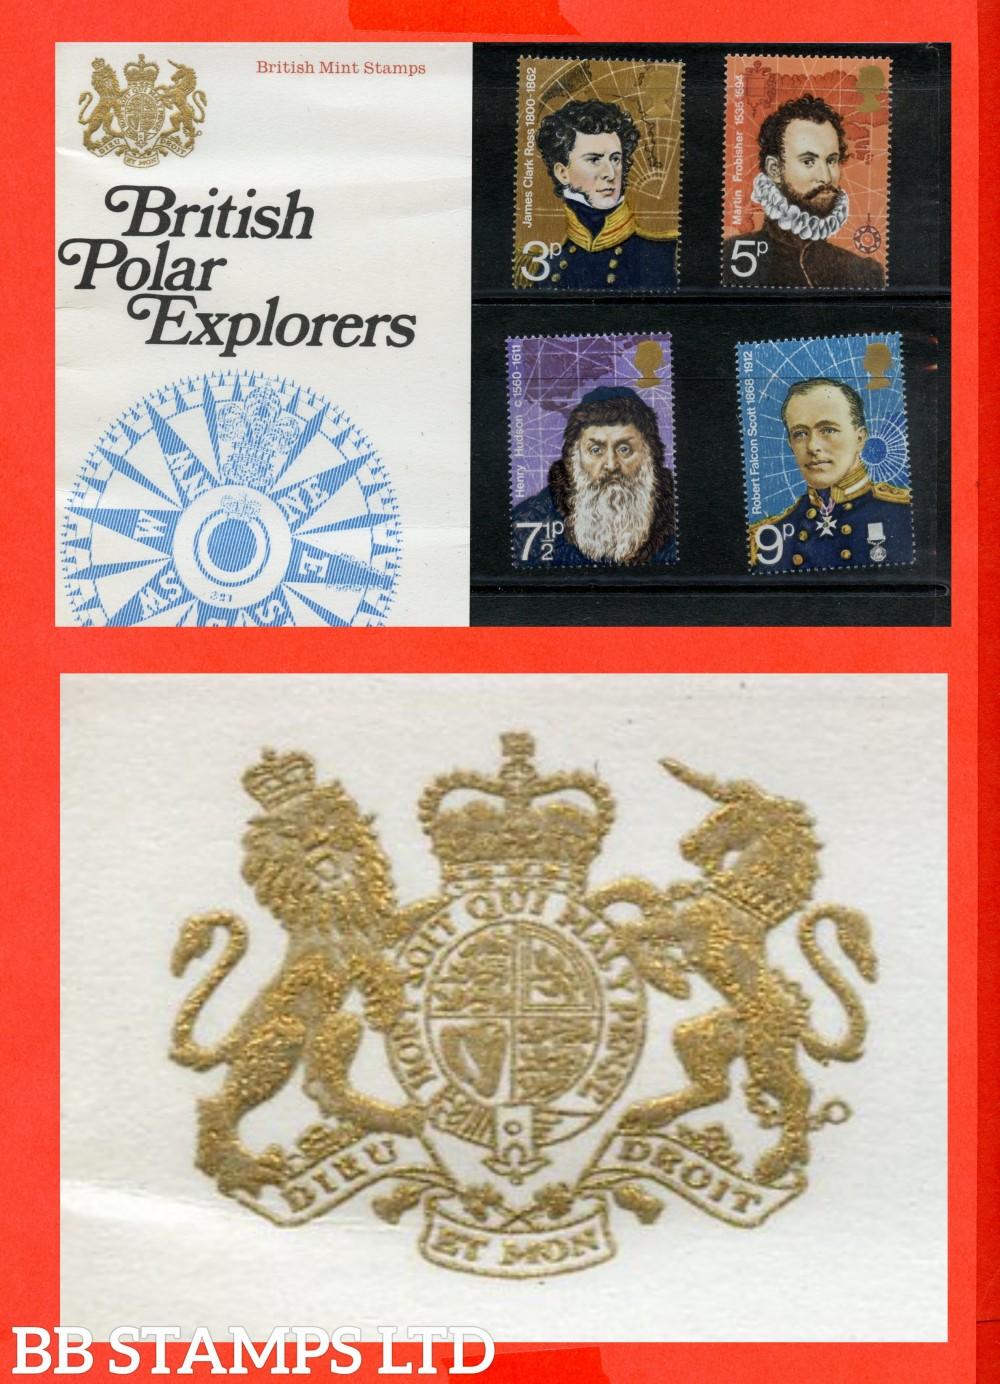 1972 British Polar Explorers Pres Pack. (Pack is Type B = Solid Crown, Flower Visible Between Unicorn's Legs)